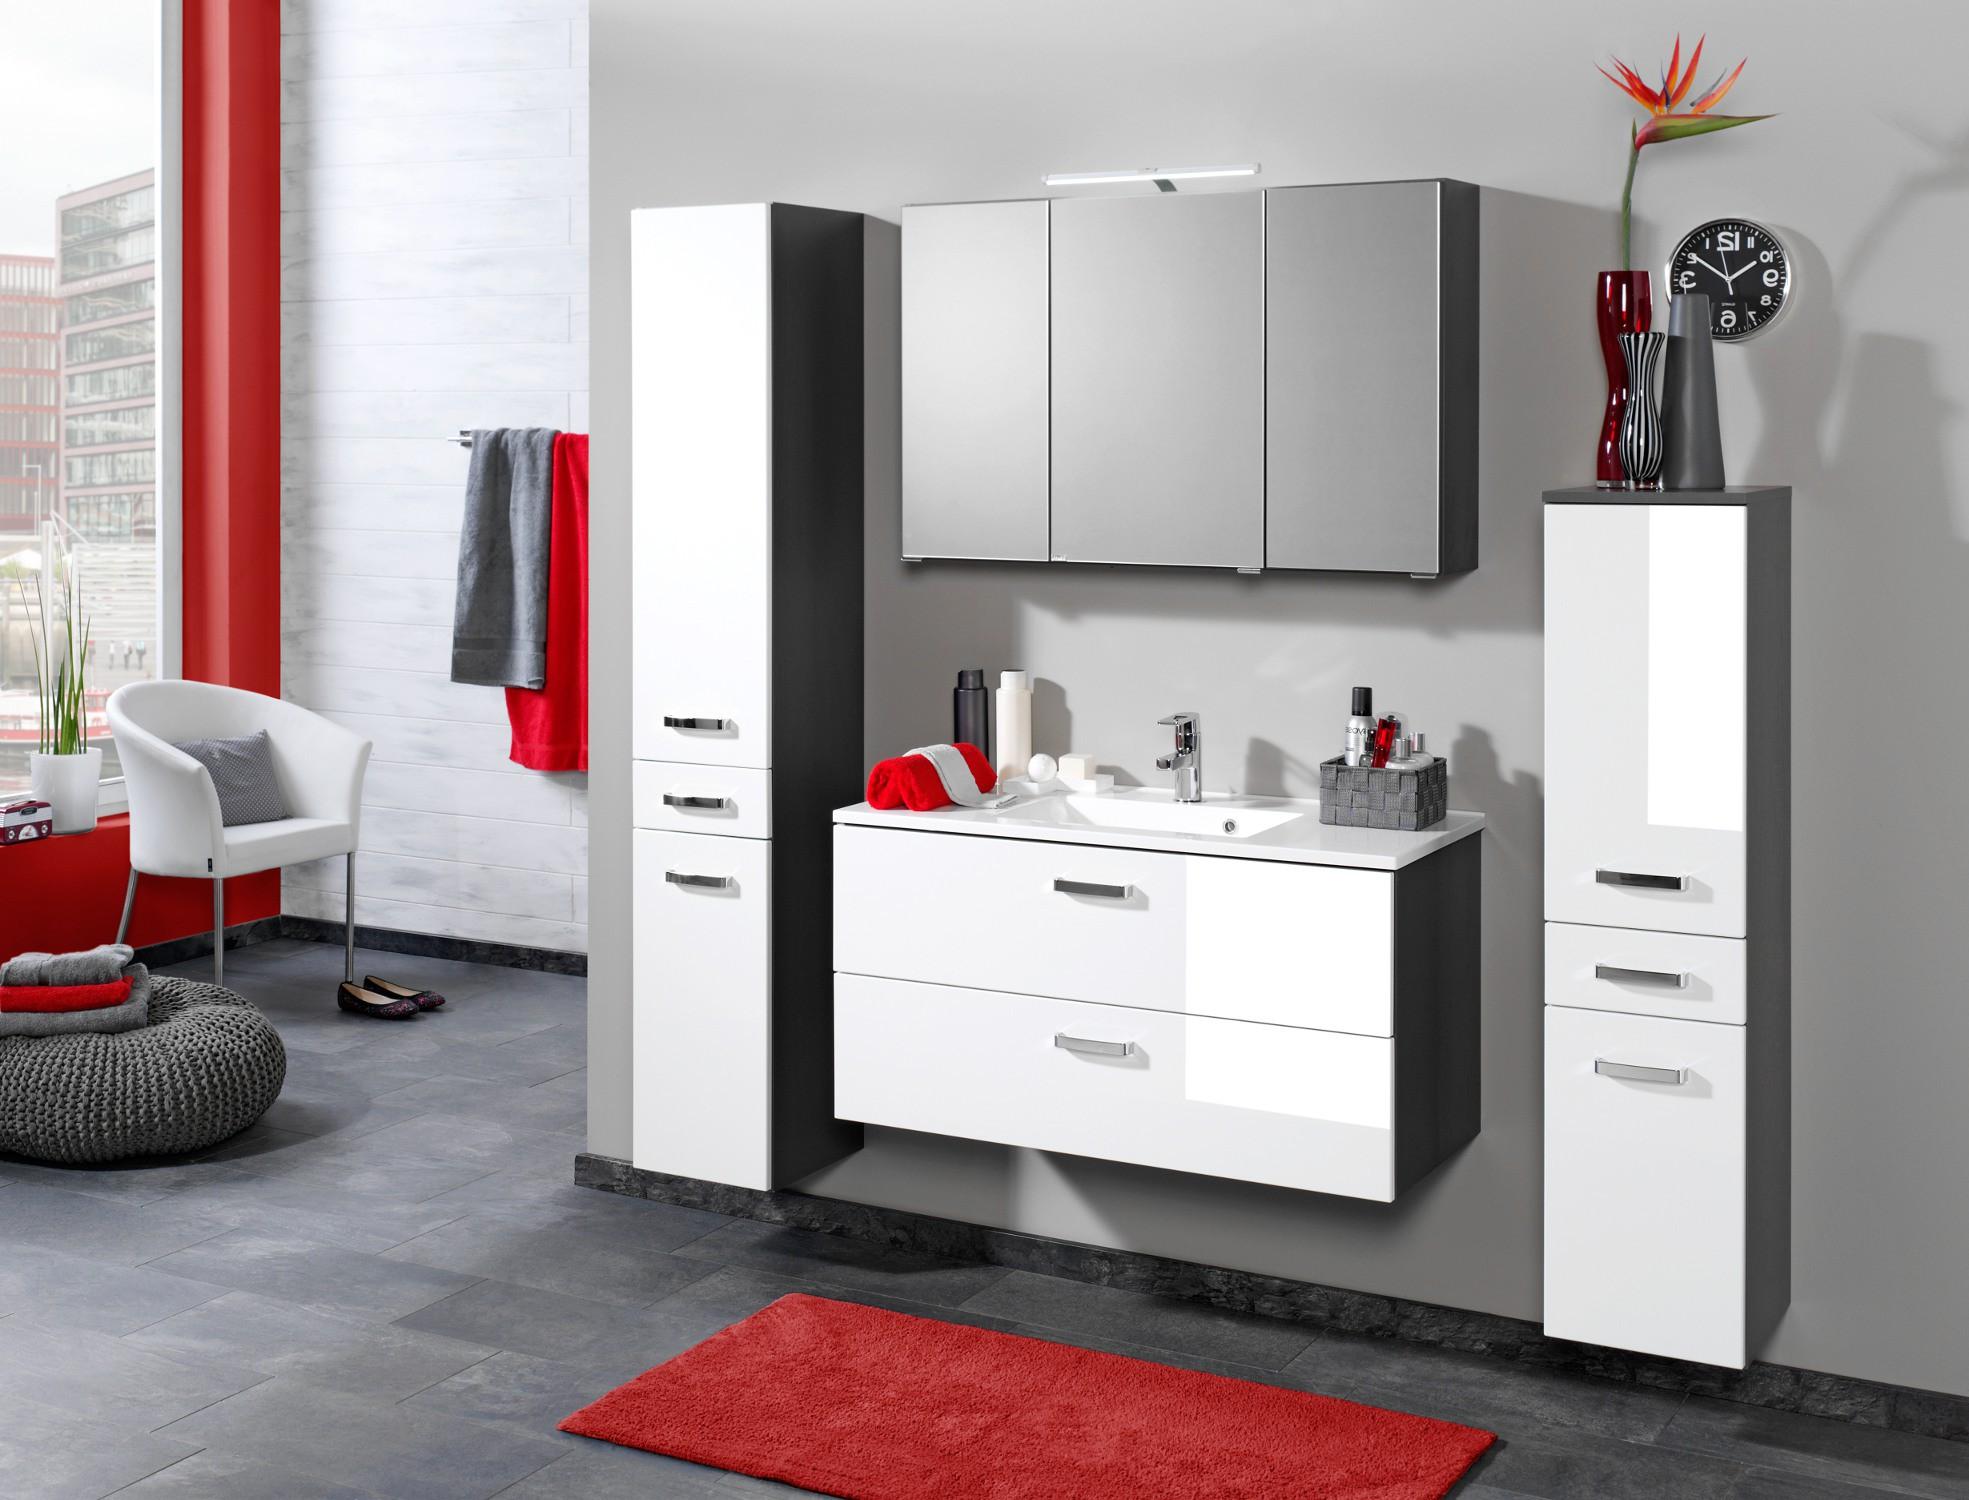 Bad Waschtisch Bologna 2 Auszuge 70 Cm Breit Hochglanz Weiss